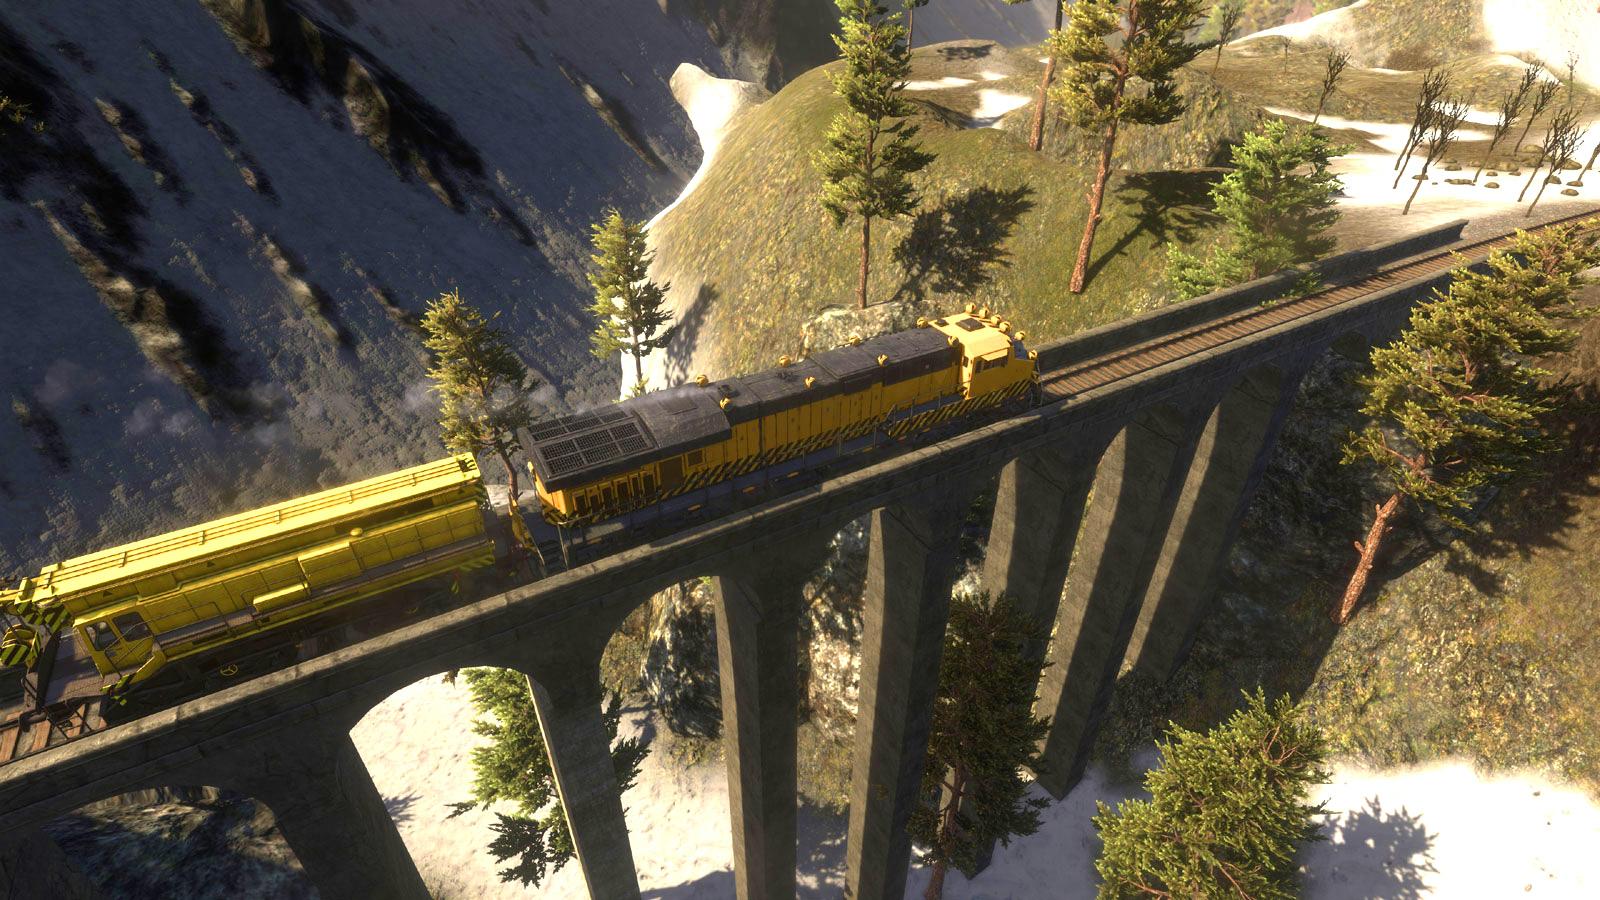 Train Mechanic Simulator 2017 Features